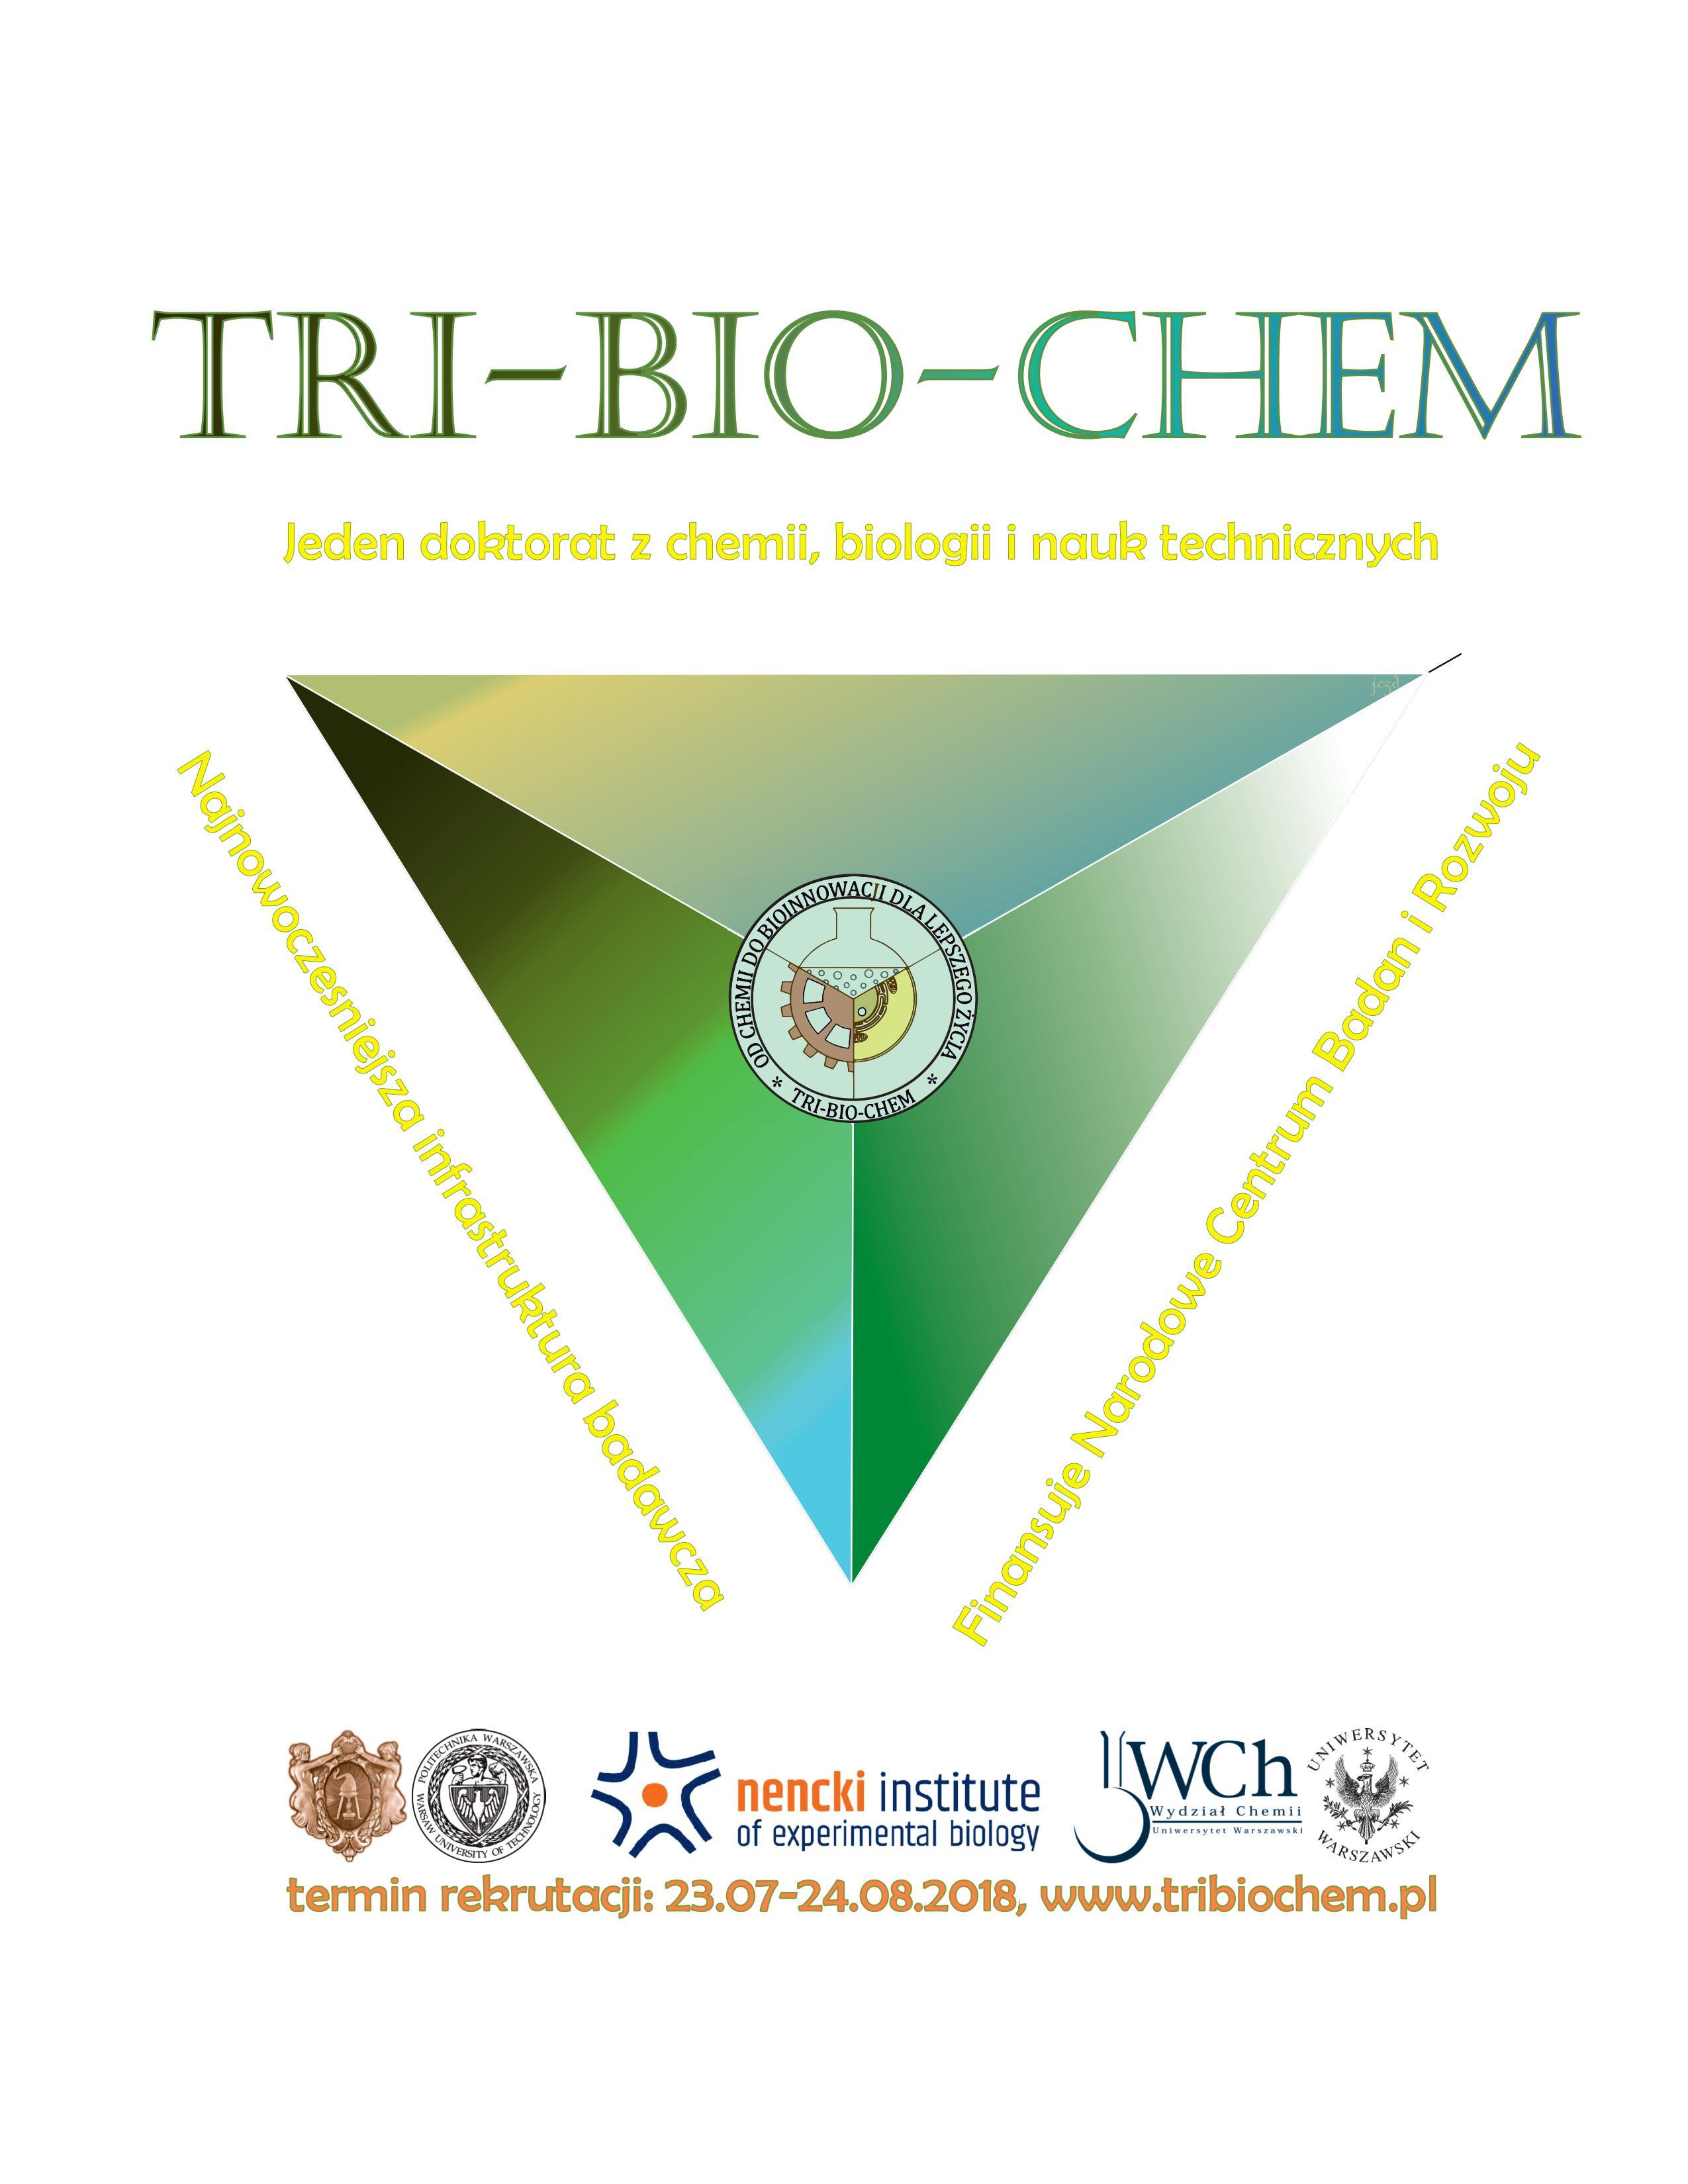 plakat_tribiochem2.jpg